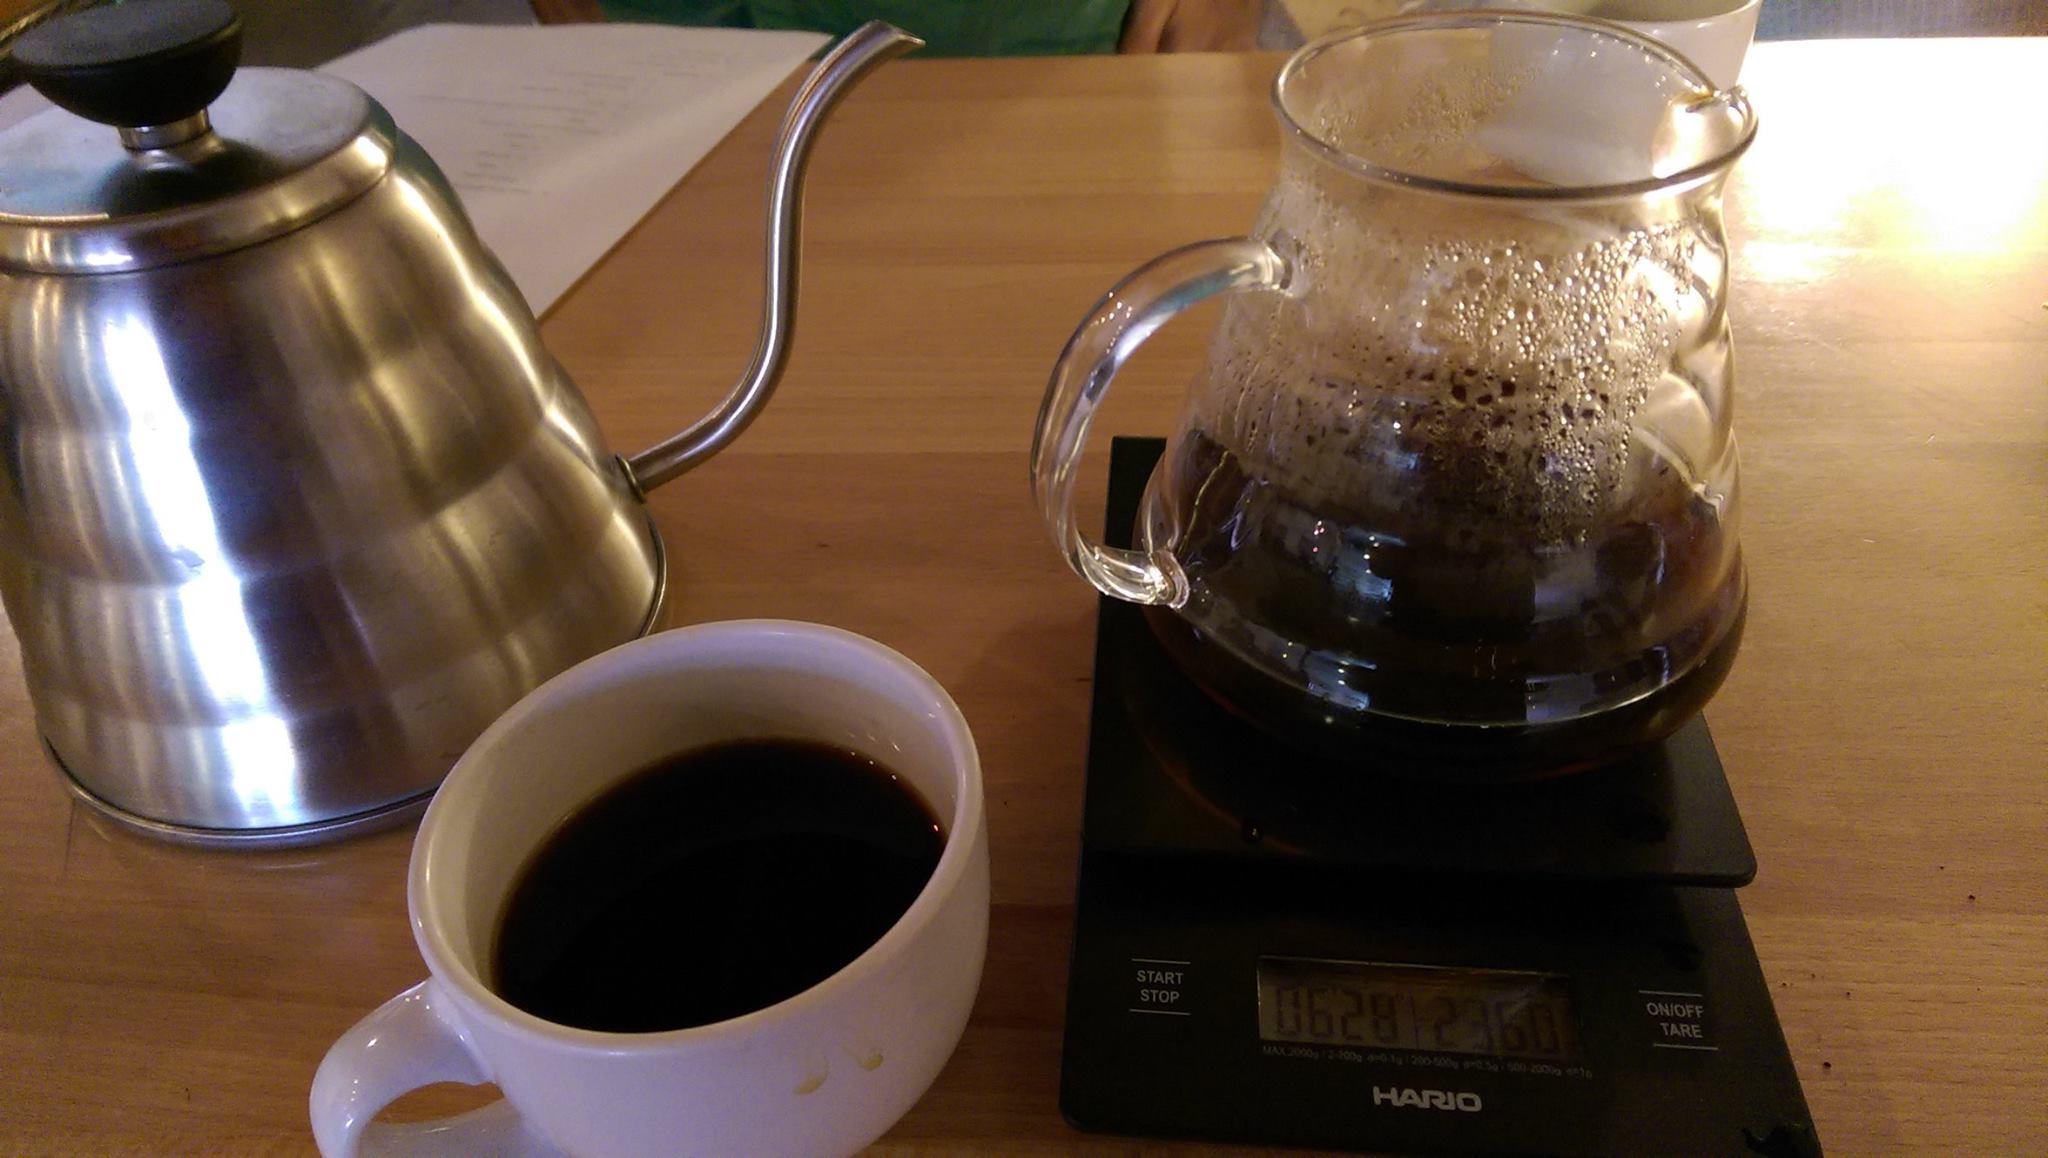 Did I tell you that I'm a coffee snob?